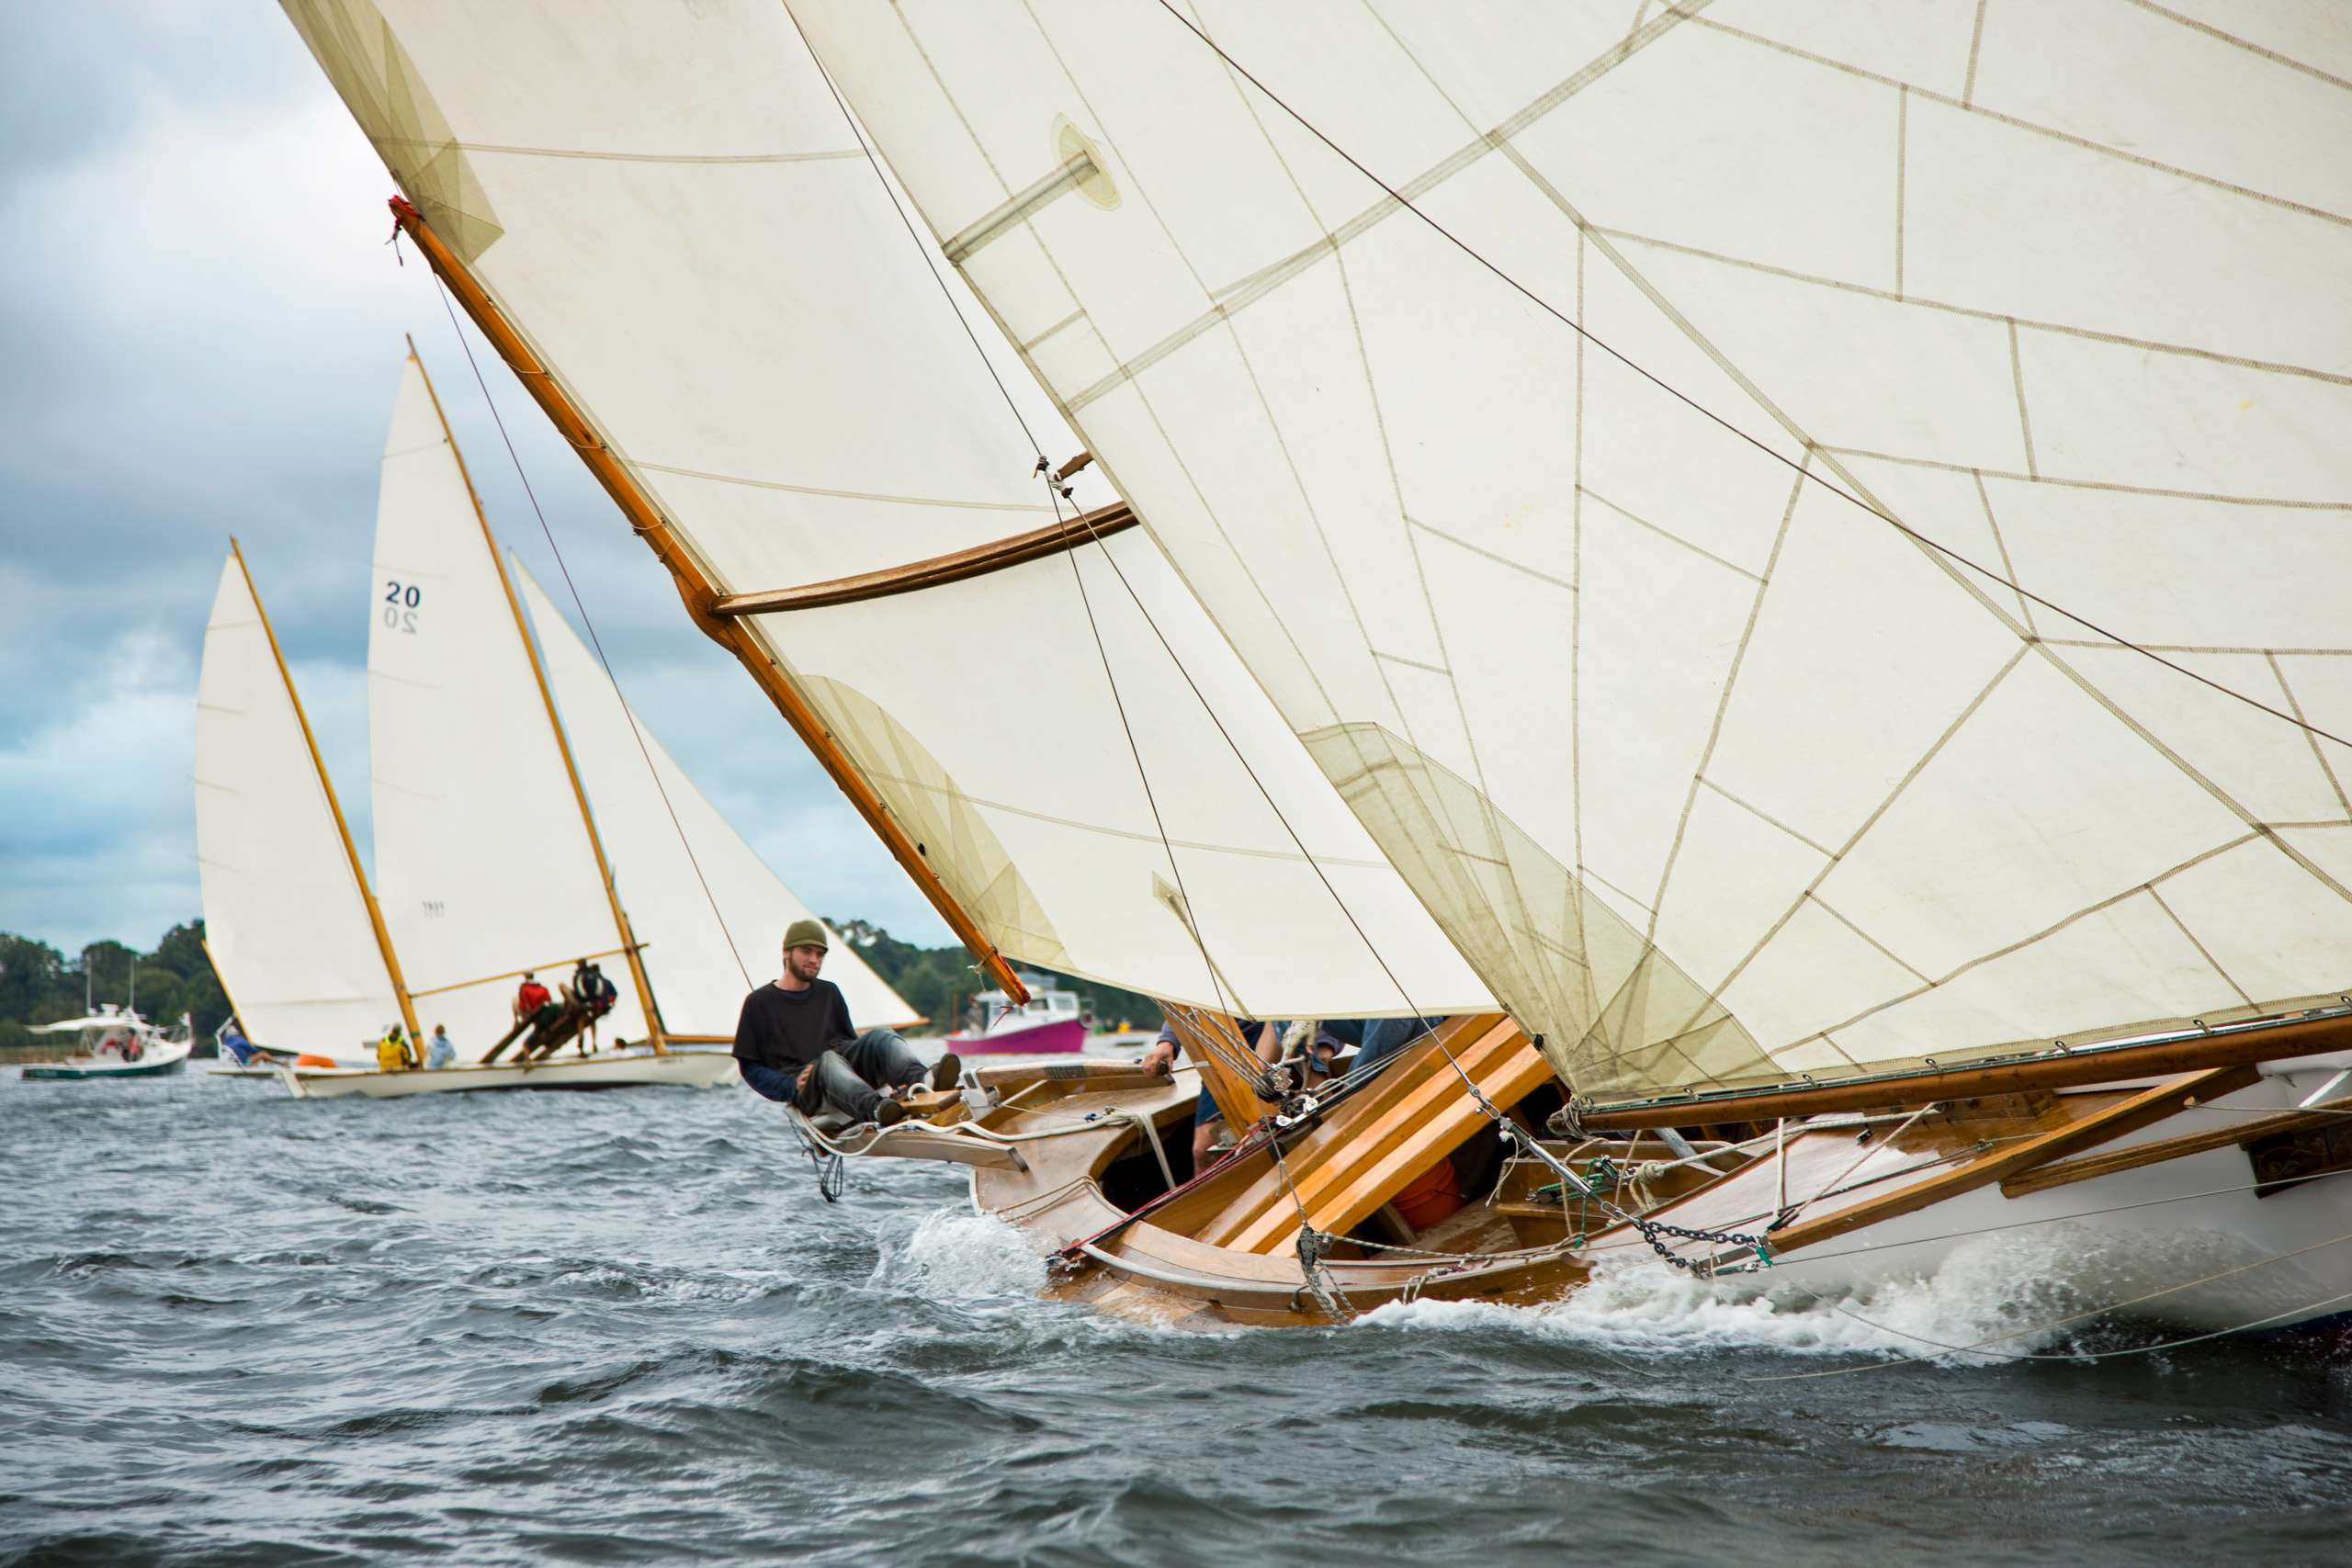 PORTFOLIO - Sailing - Log Canoes #13   PCG528